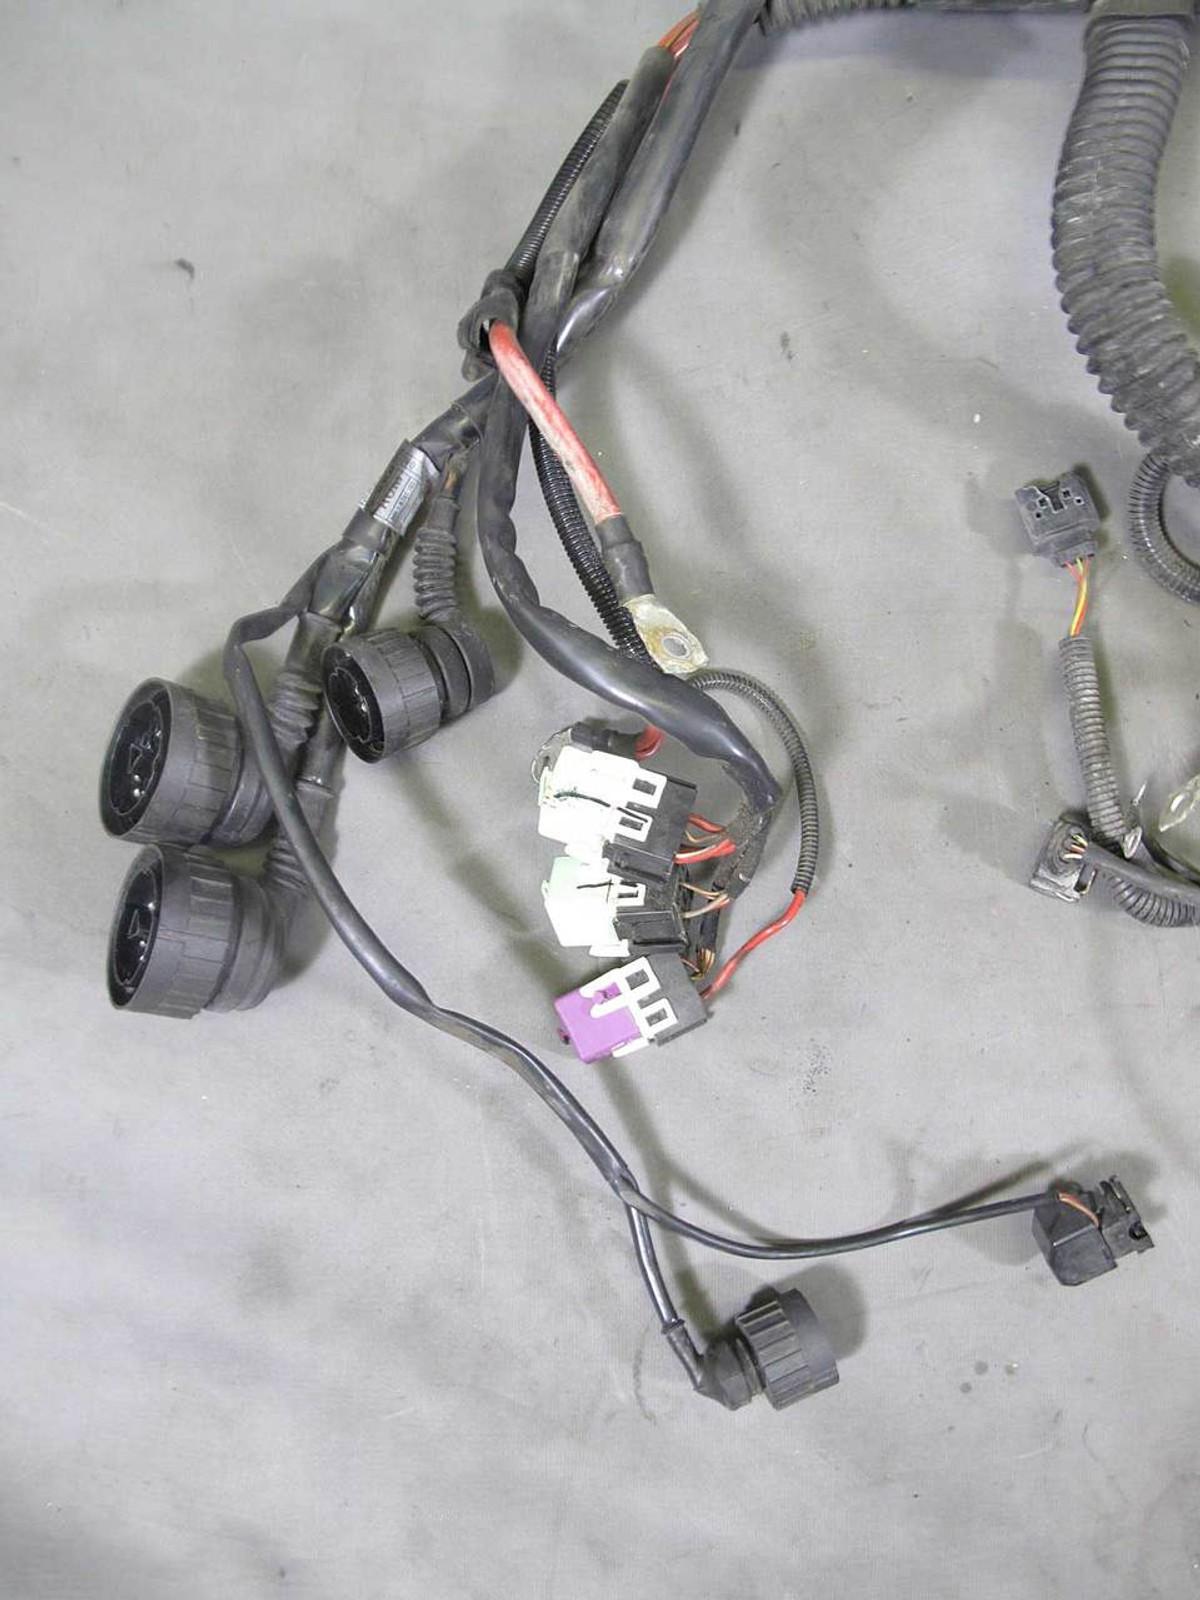 medium resolution of toyota wire harness repair manual 1 wiring diagram source wire harness sxf dirt bike no keysxdirtbikewiringjpg